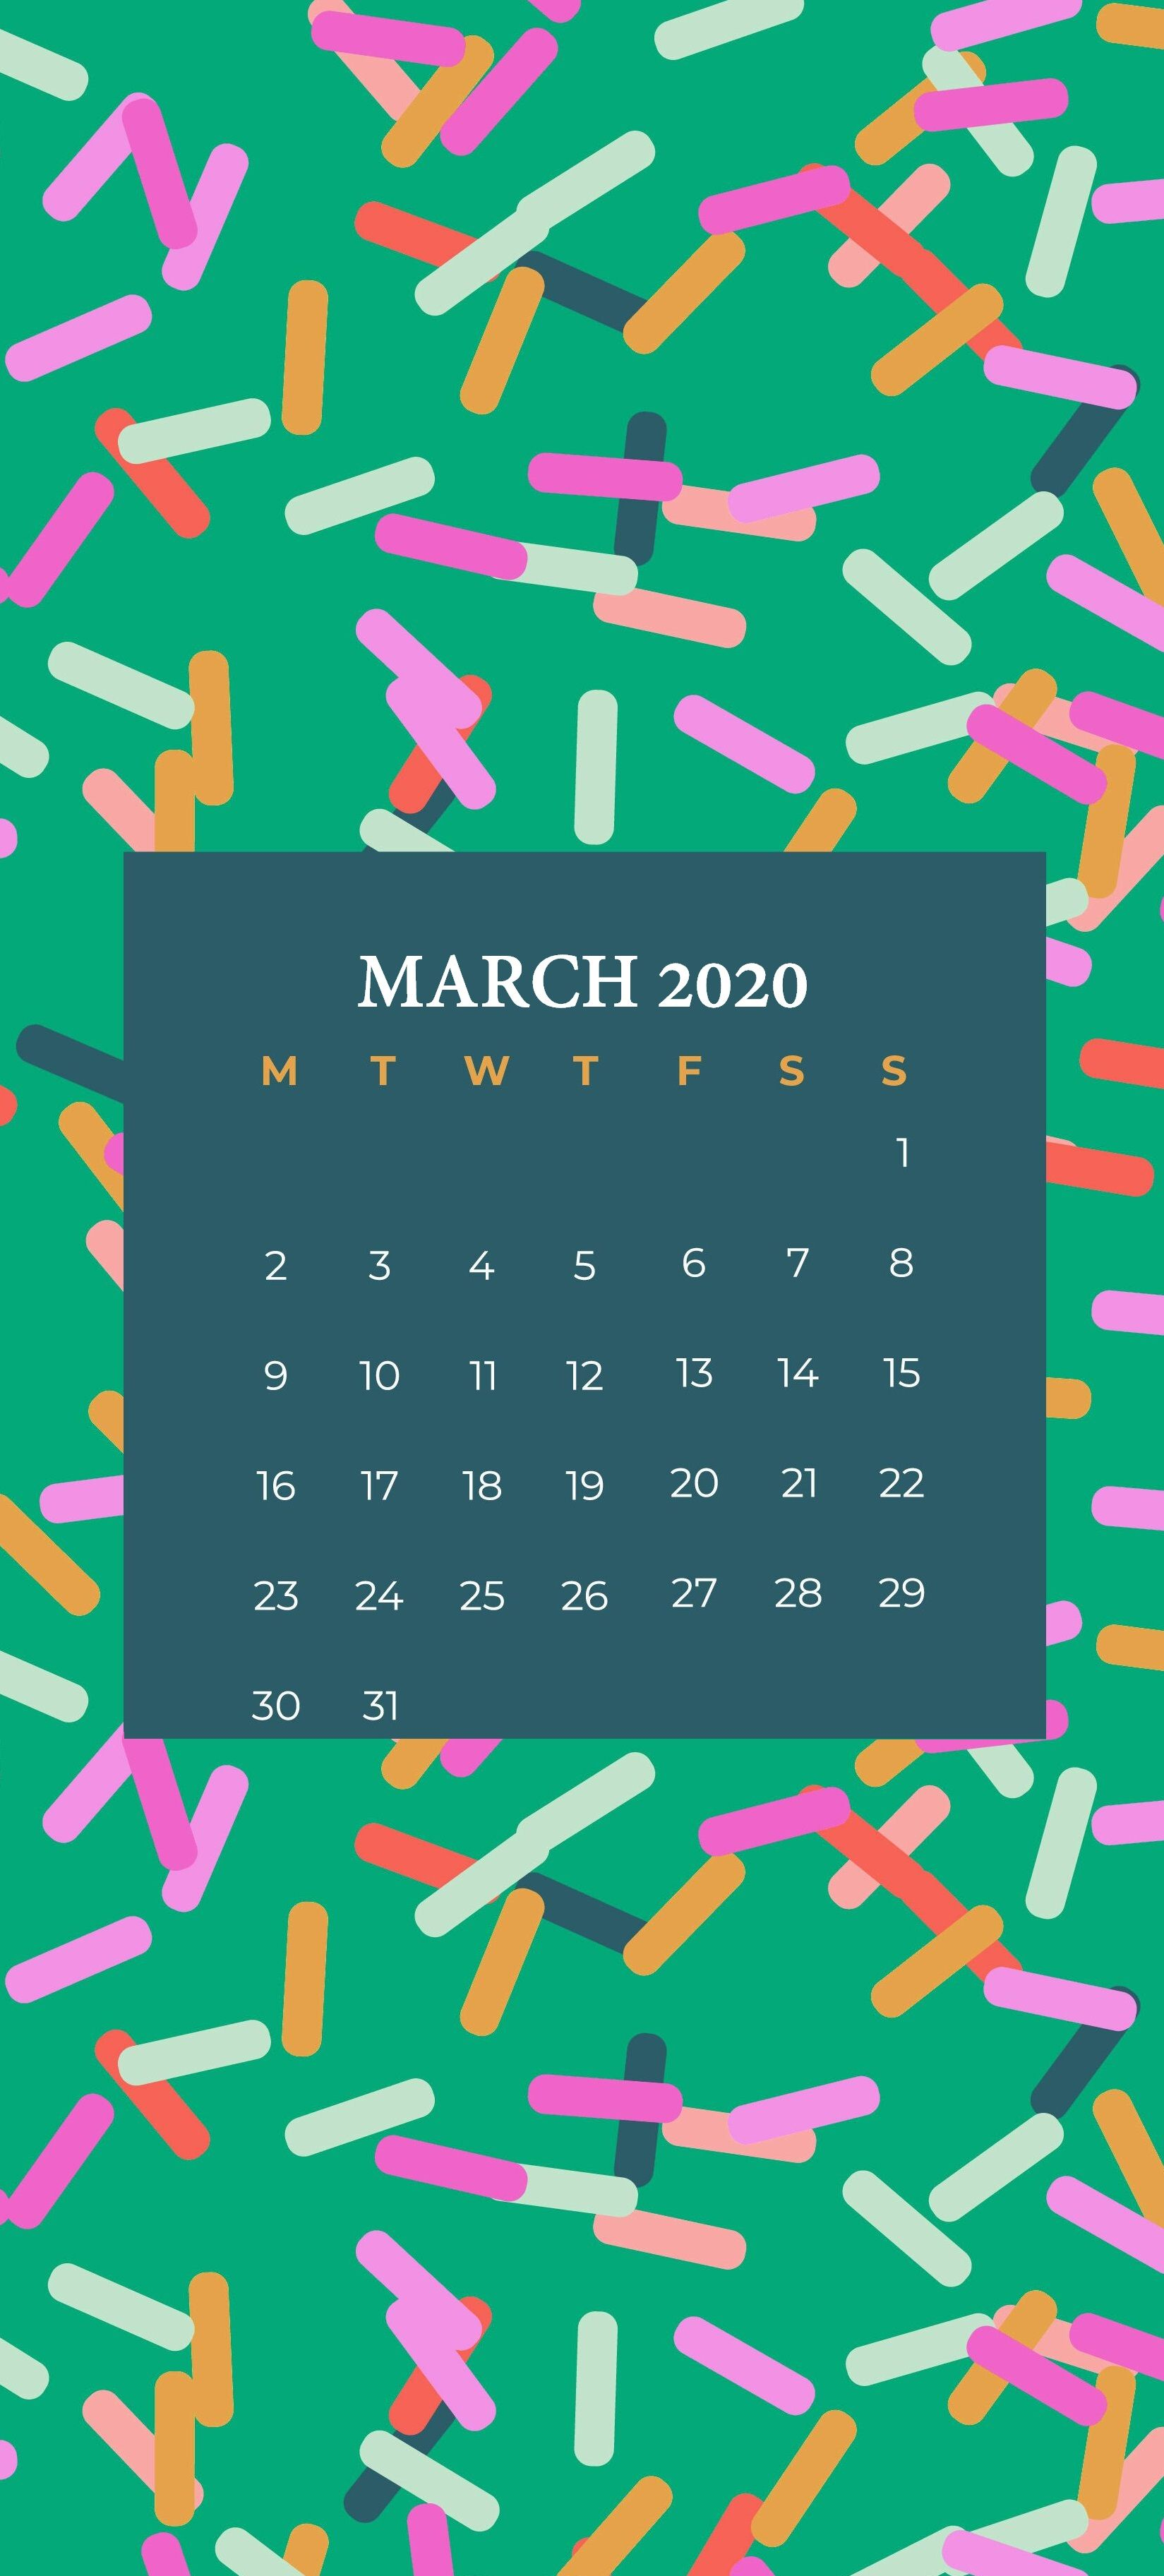 iPhone March 2020 Wallpaper Calendar in 2020 Calendar